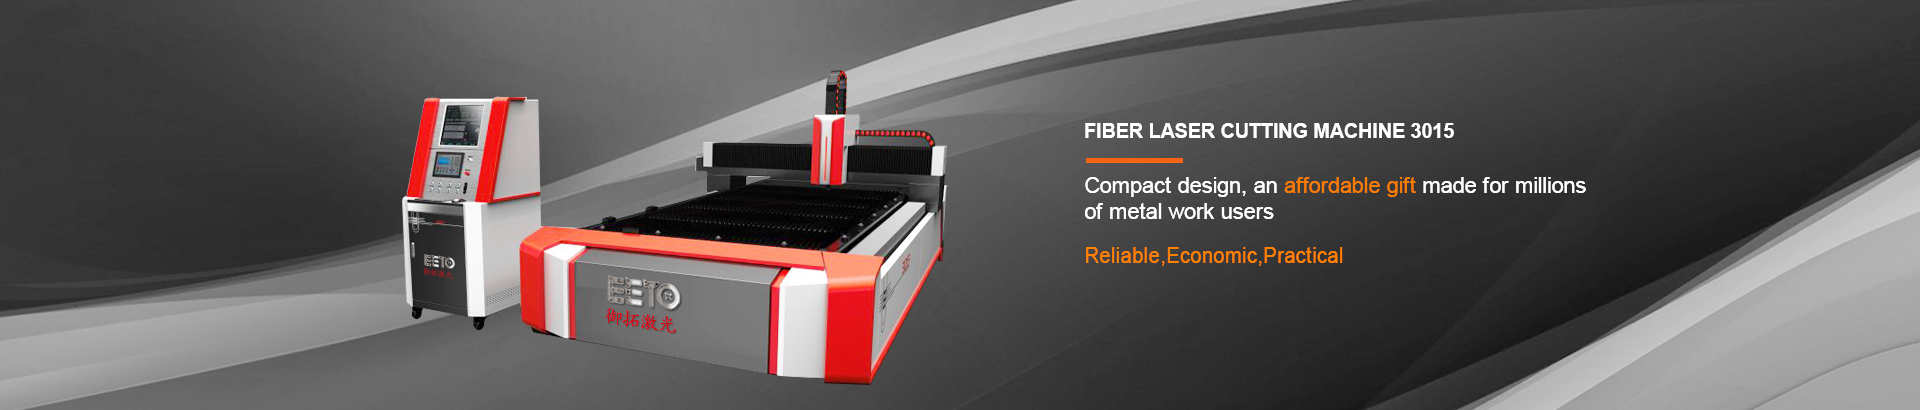 Fiber Laser Cutting Machine For Metal Cutting Laser